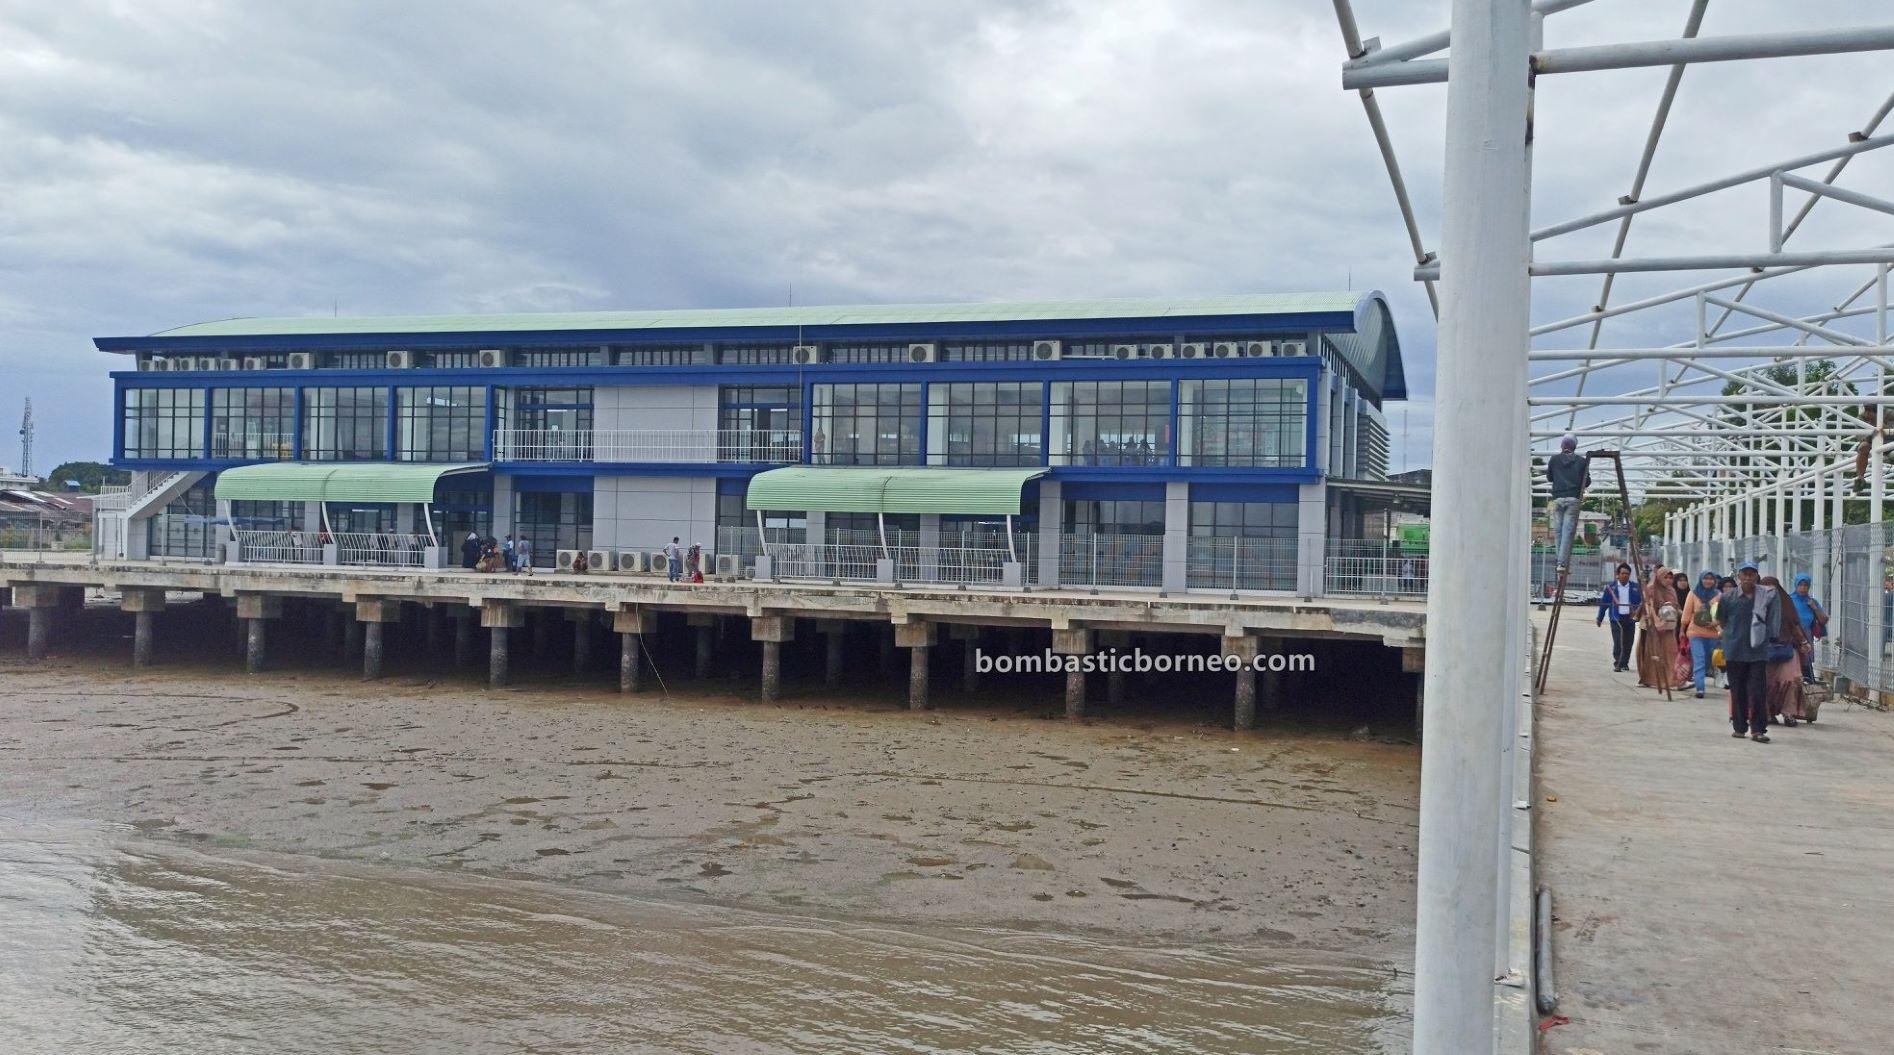 pelabuhan, ferry ride, Kapal Besar, international, Transportation, backpackers, exploration, Obyek wisata, Tourism, travel guide, Cross Border, Trans Border, Borneo, 探索婆罗洲游踪, 印尼北加里曼丹